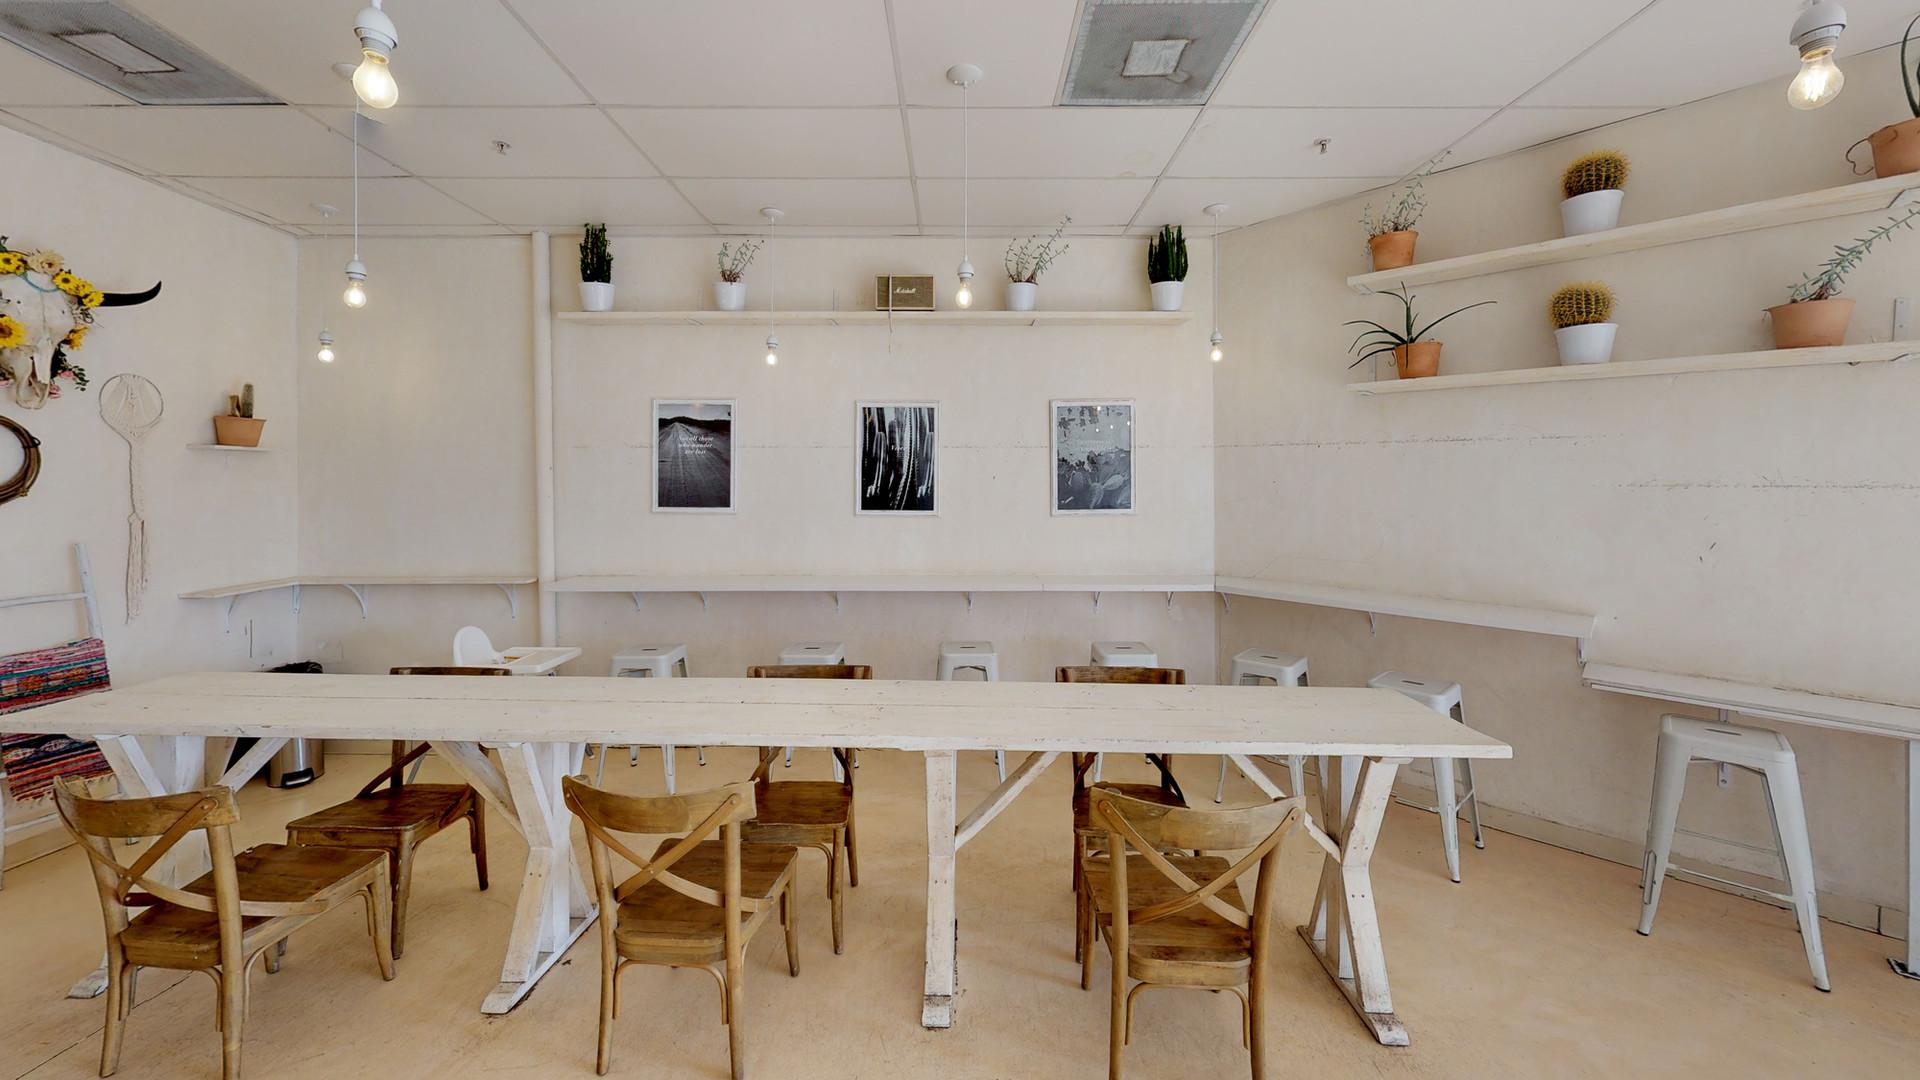 1808-S-Pacific-Coast-Hwy-Dining-Room.jpg